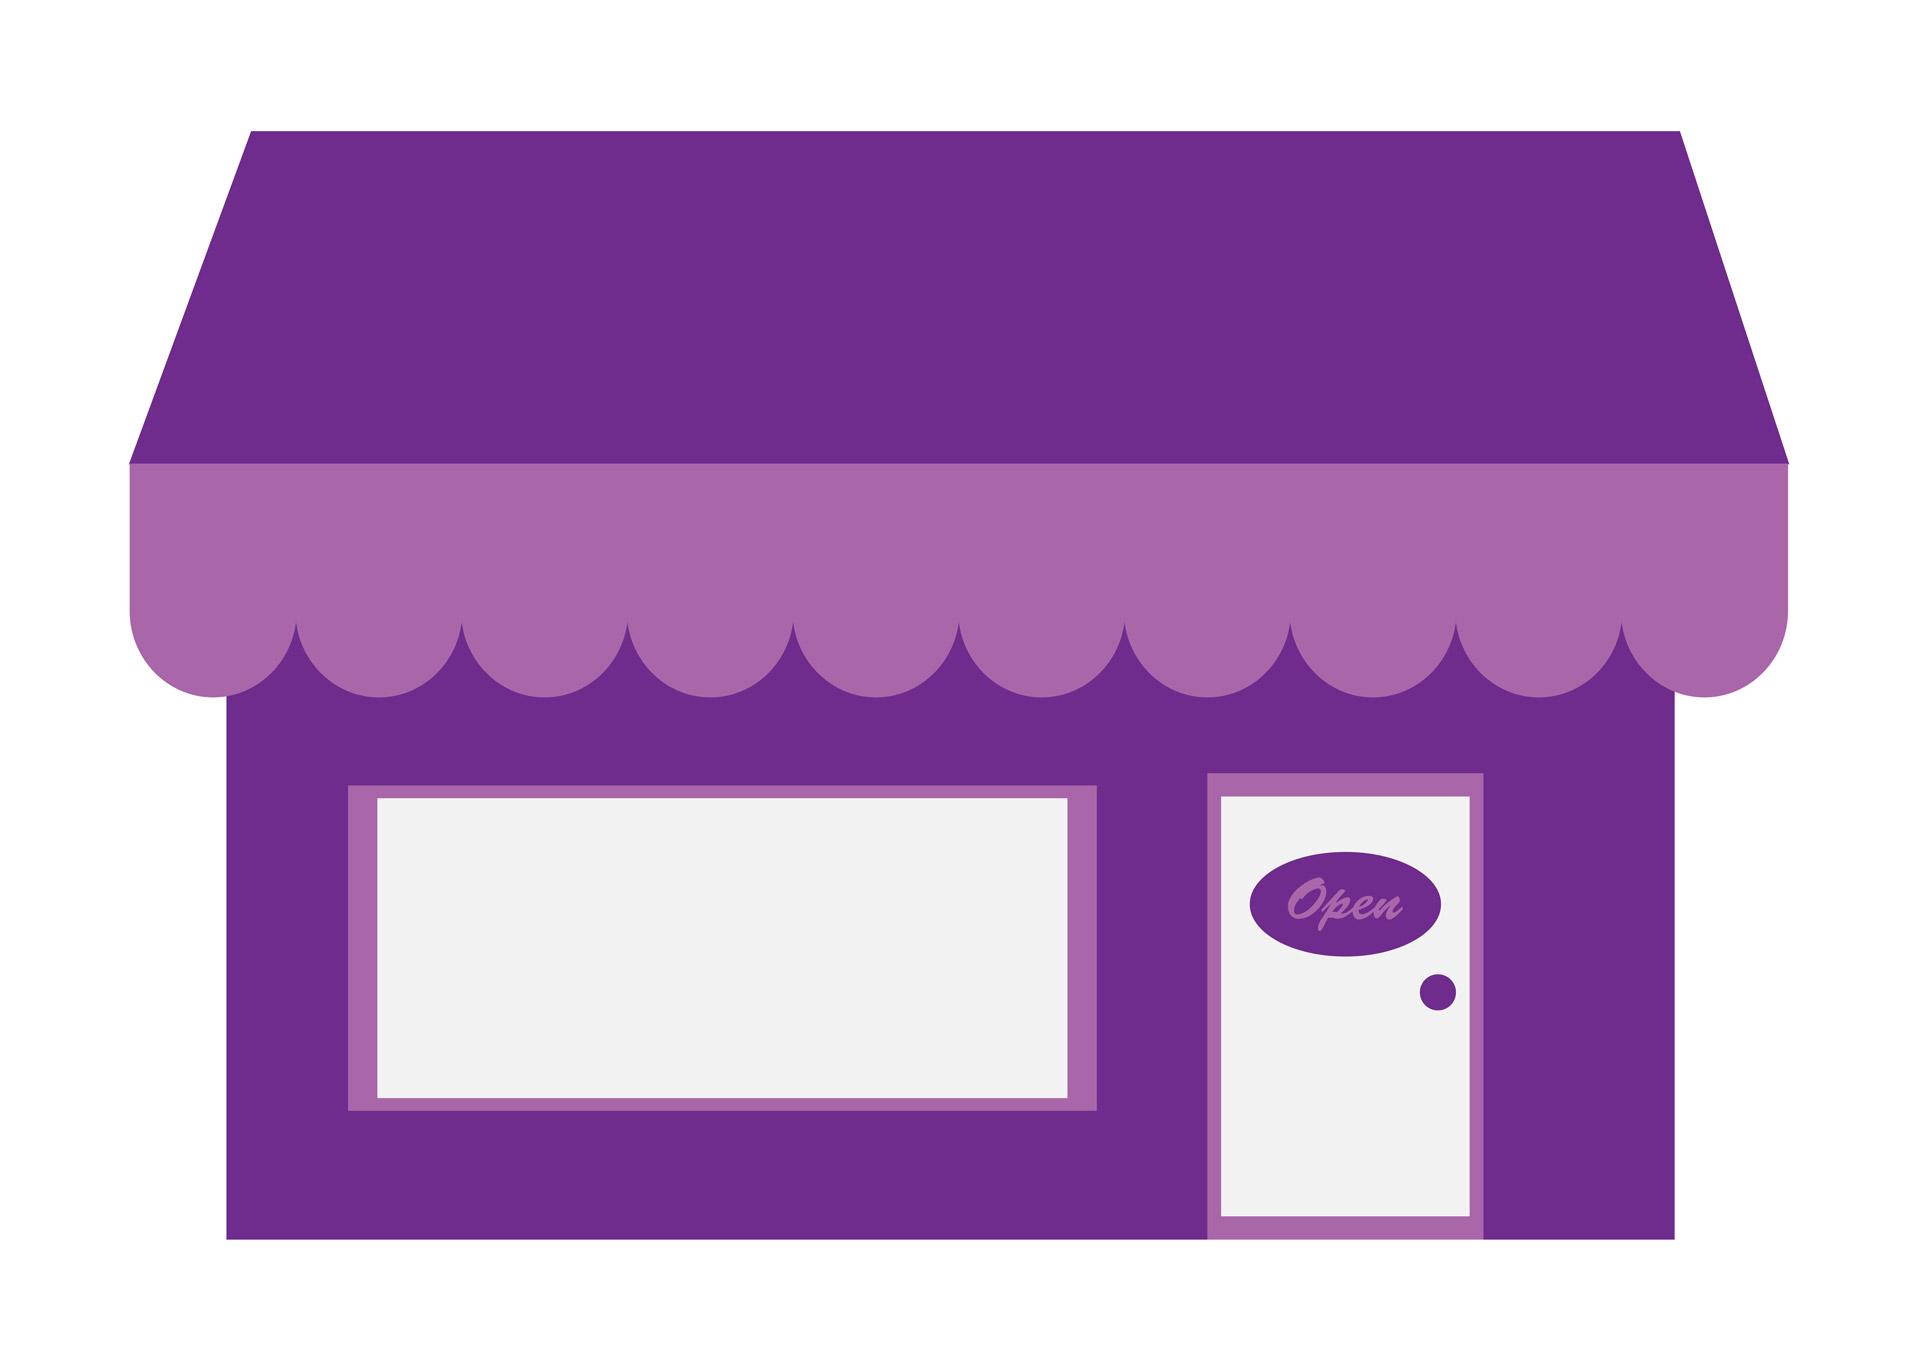 Shop clipart. Store clip art free